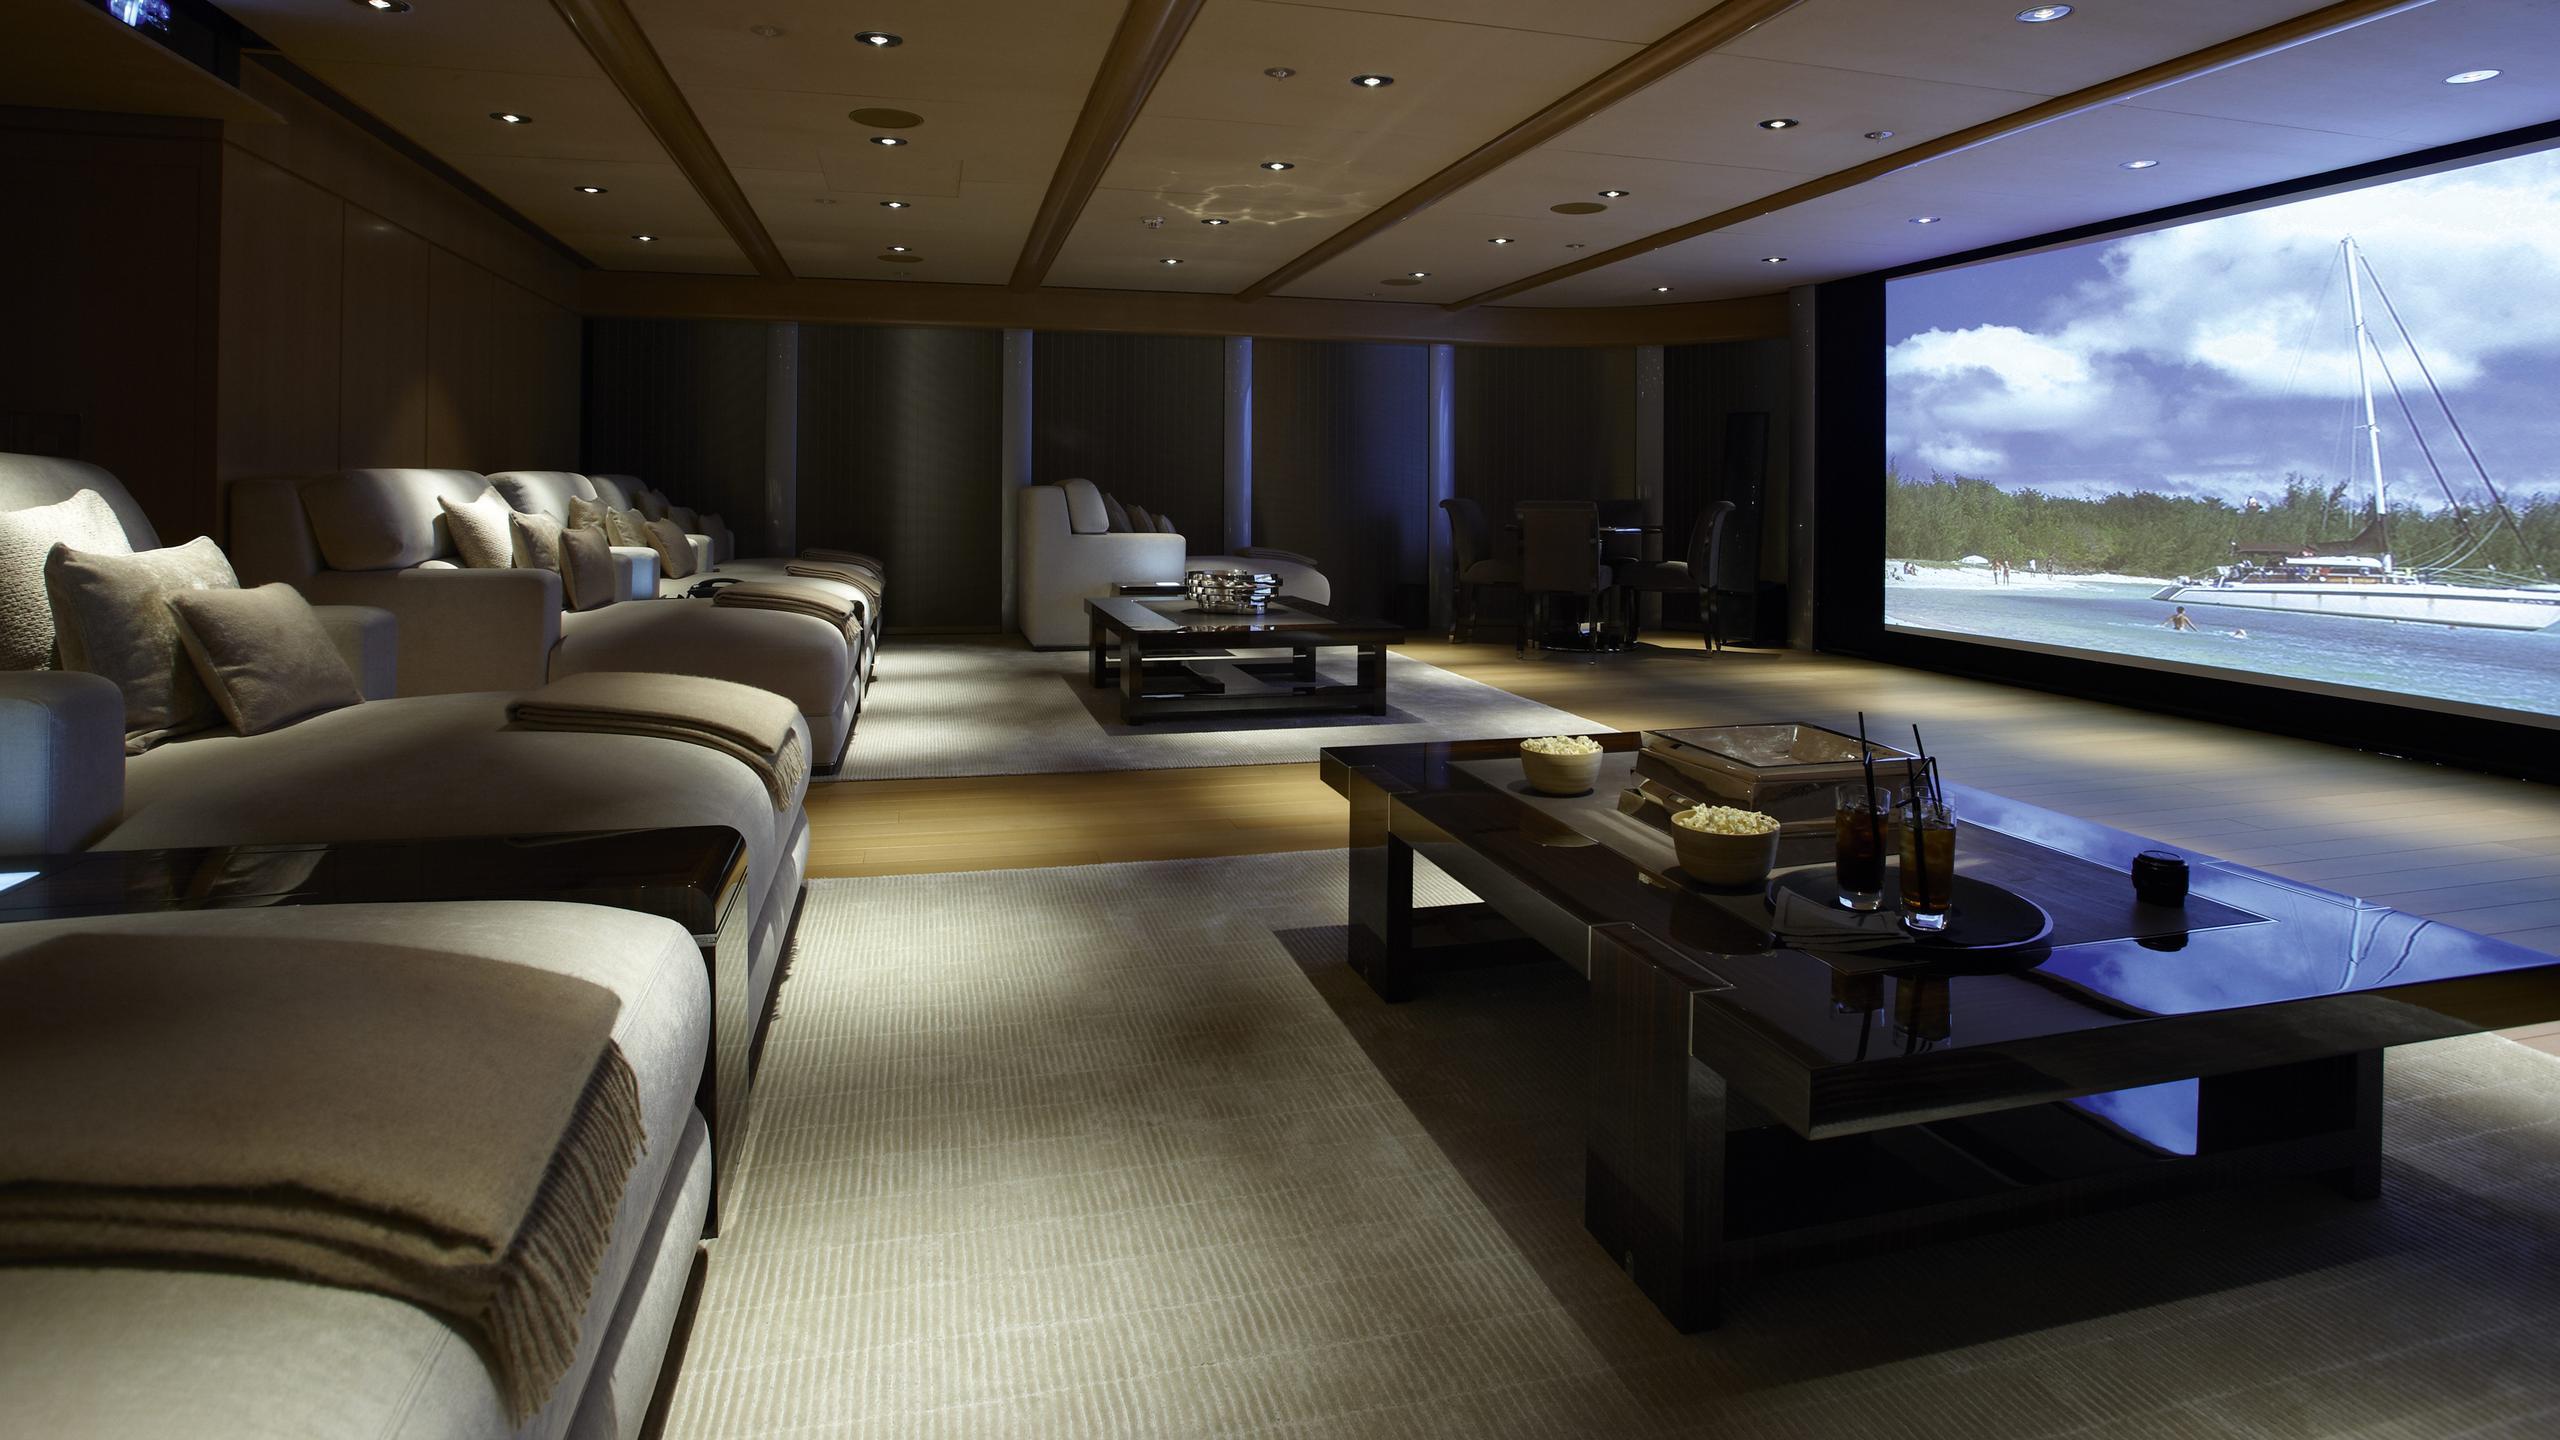 musashi-motor-yacht-feadhsip-2011-88m-cinema